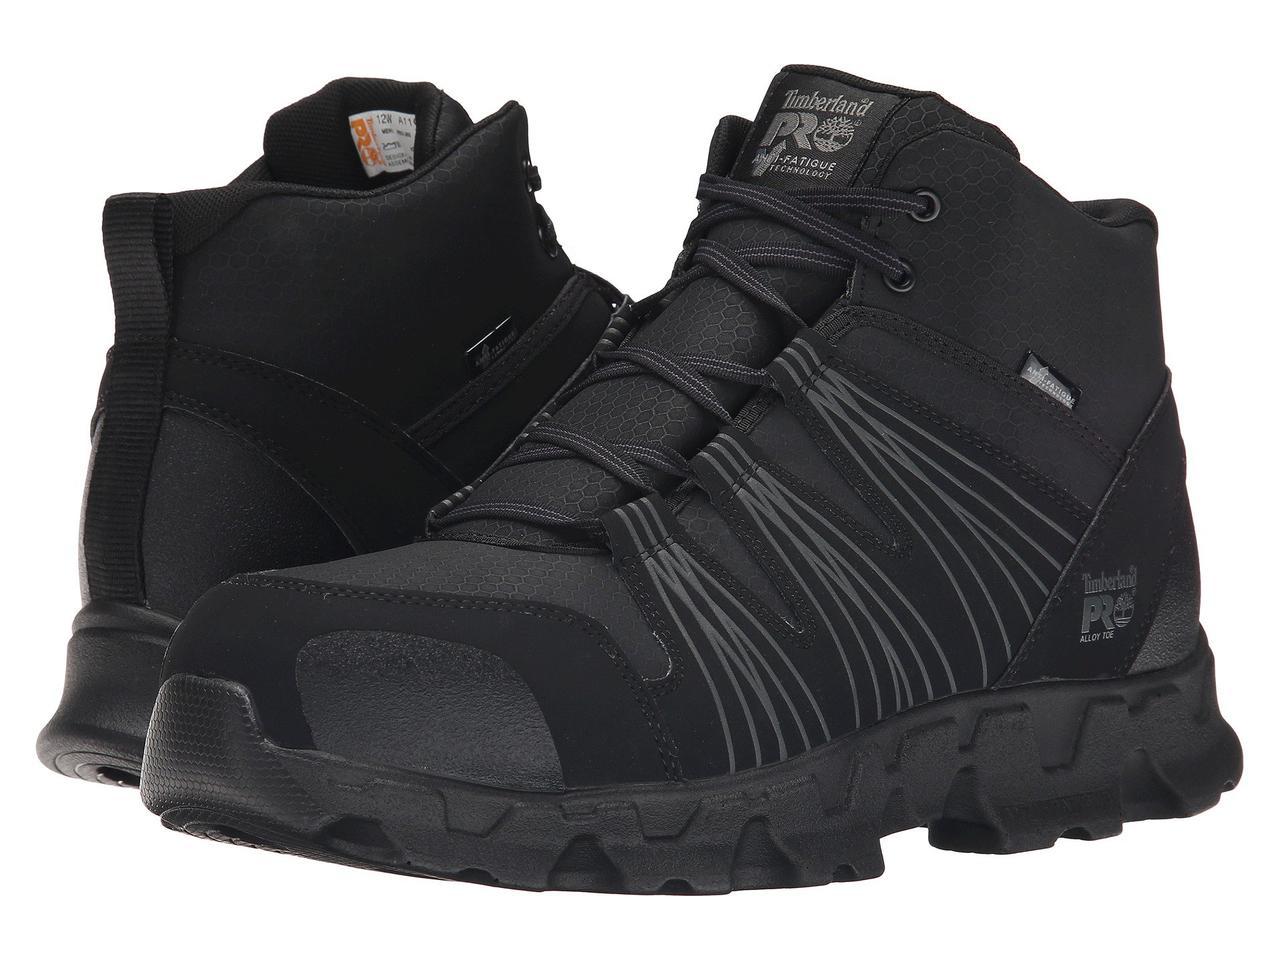 Ботинки/Сапоги (Оригинал) Timberland PRO Powertrain Mid Alloy Safety Toe ESD Black Synthetic